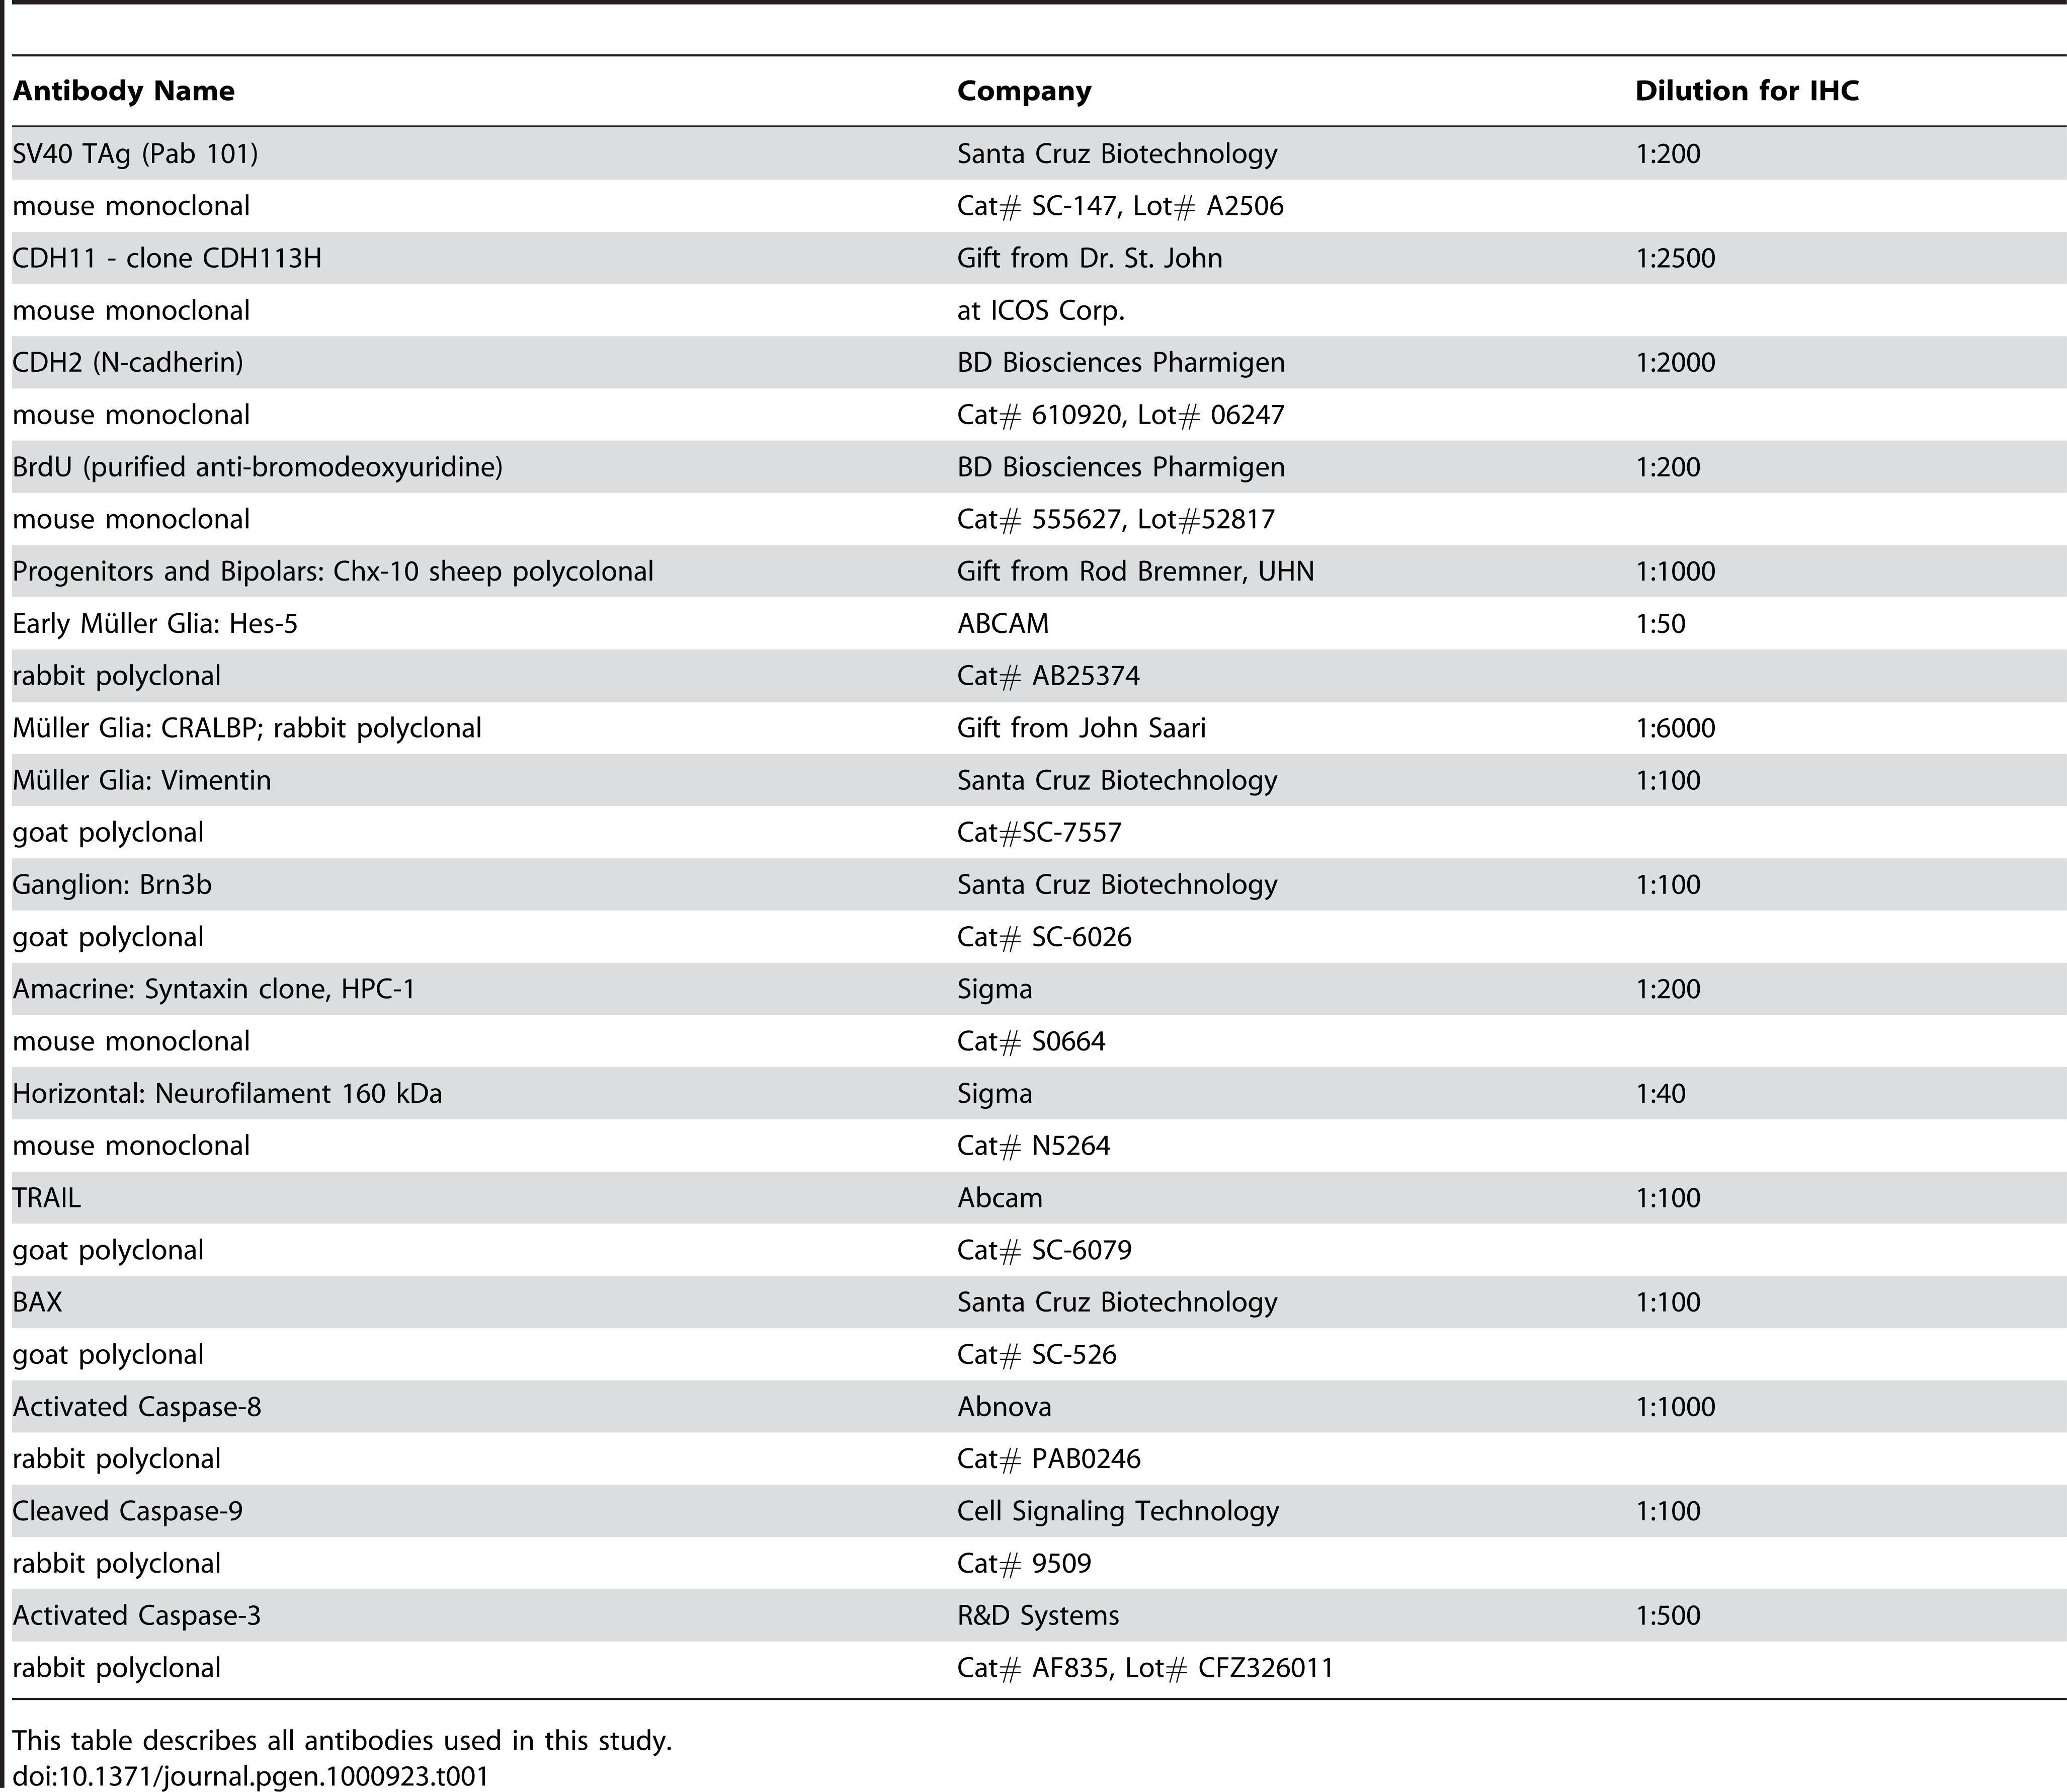 Antibody list.